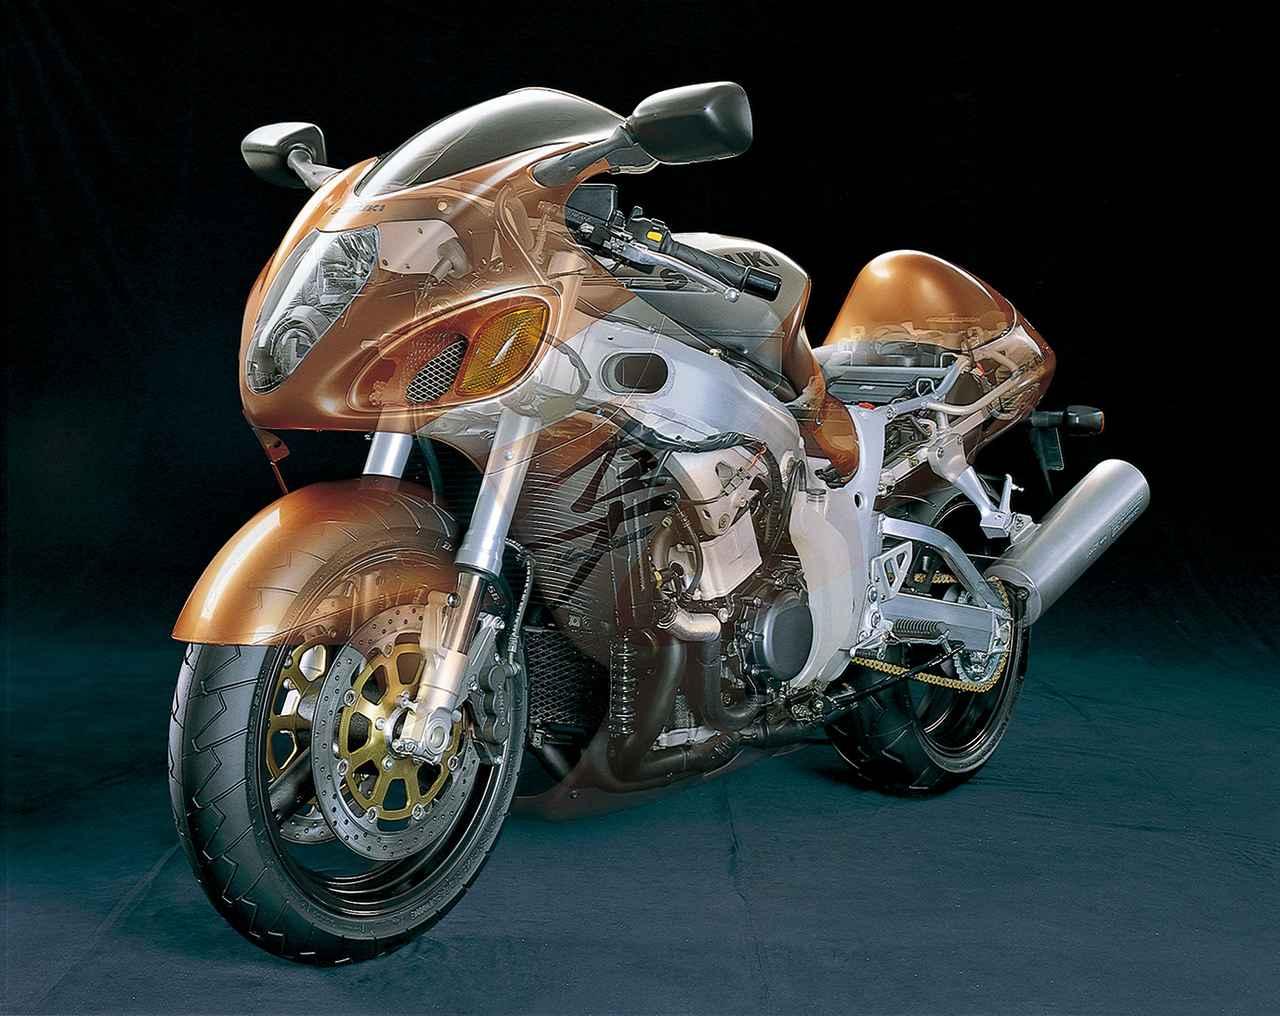 Images : 2番目の画像 - 1999年SUZUKI GSX1300R HAYABUSA - LAWRENCE - Motorcycle x Cars + α = Your Life.